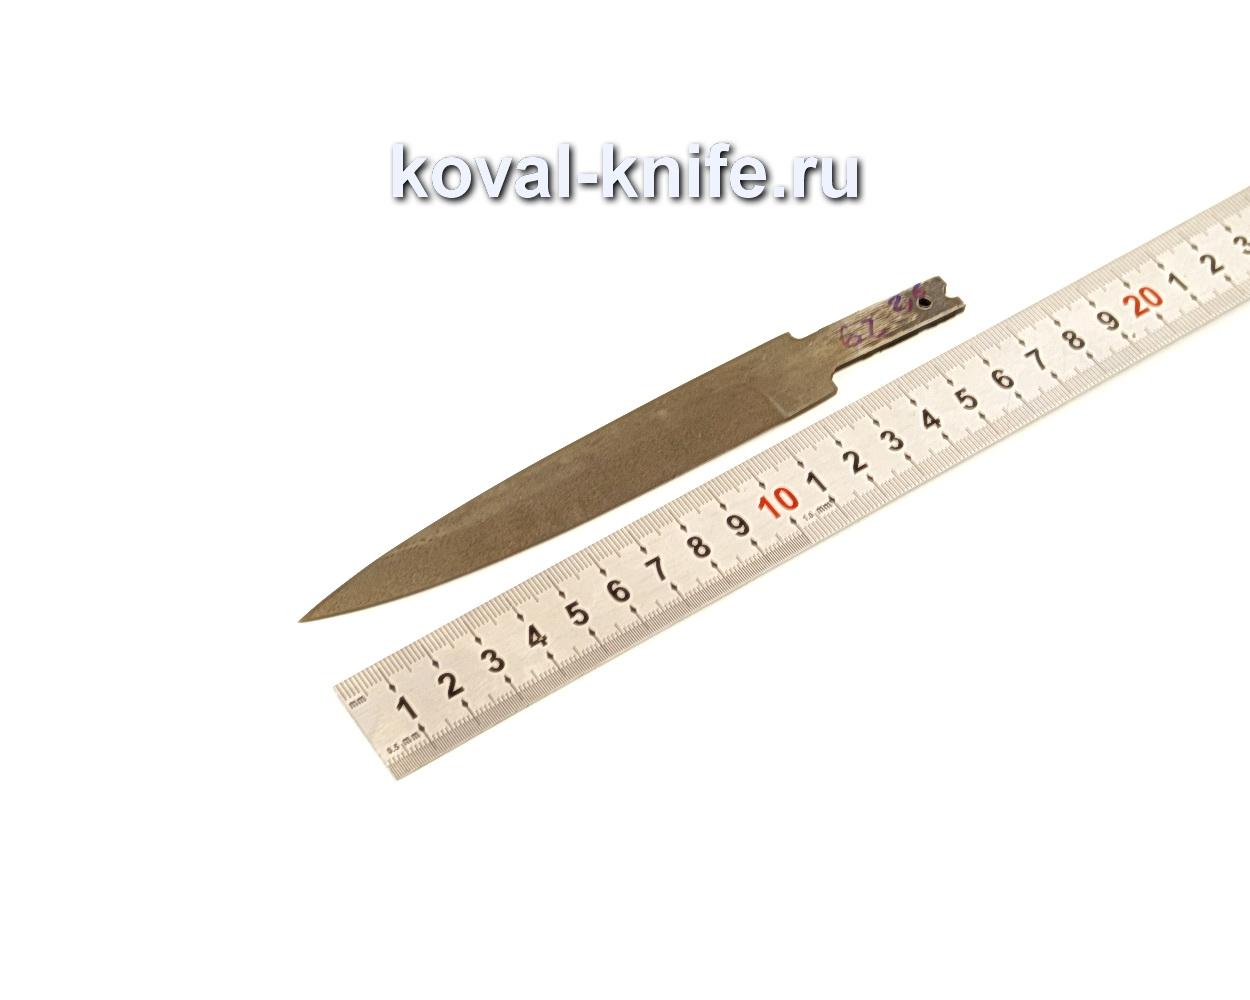 Клинок для ножа из кованой стали Х12МФ N62